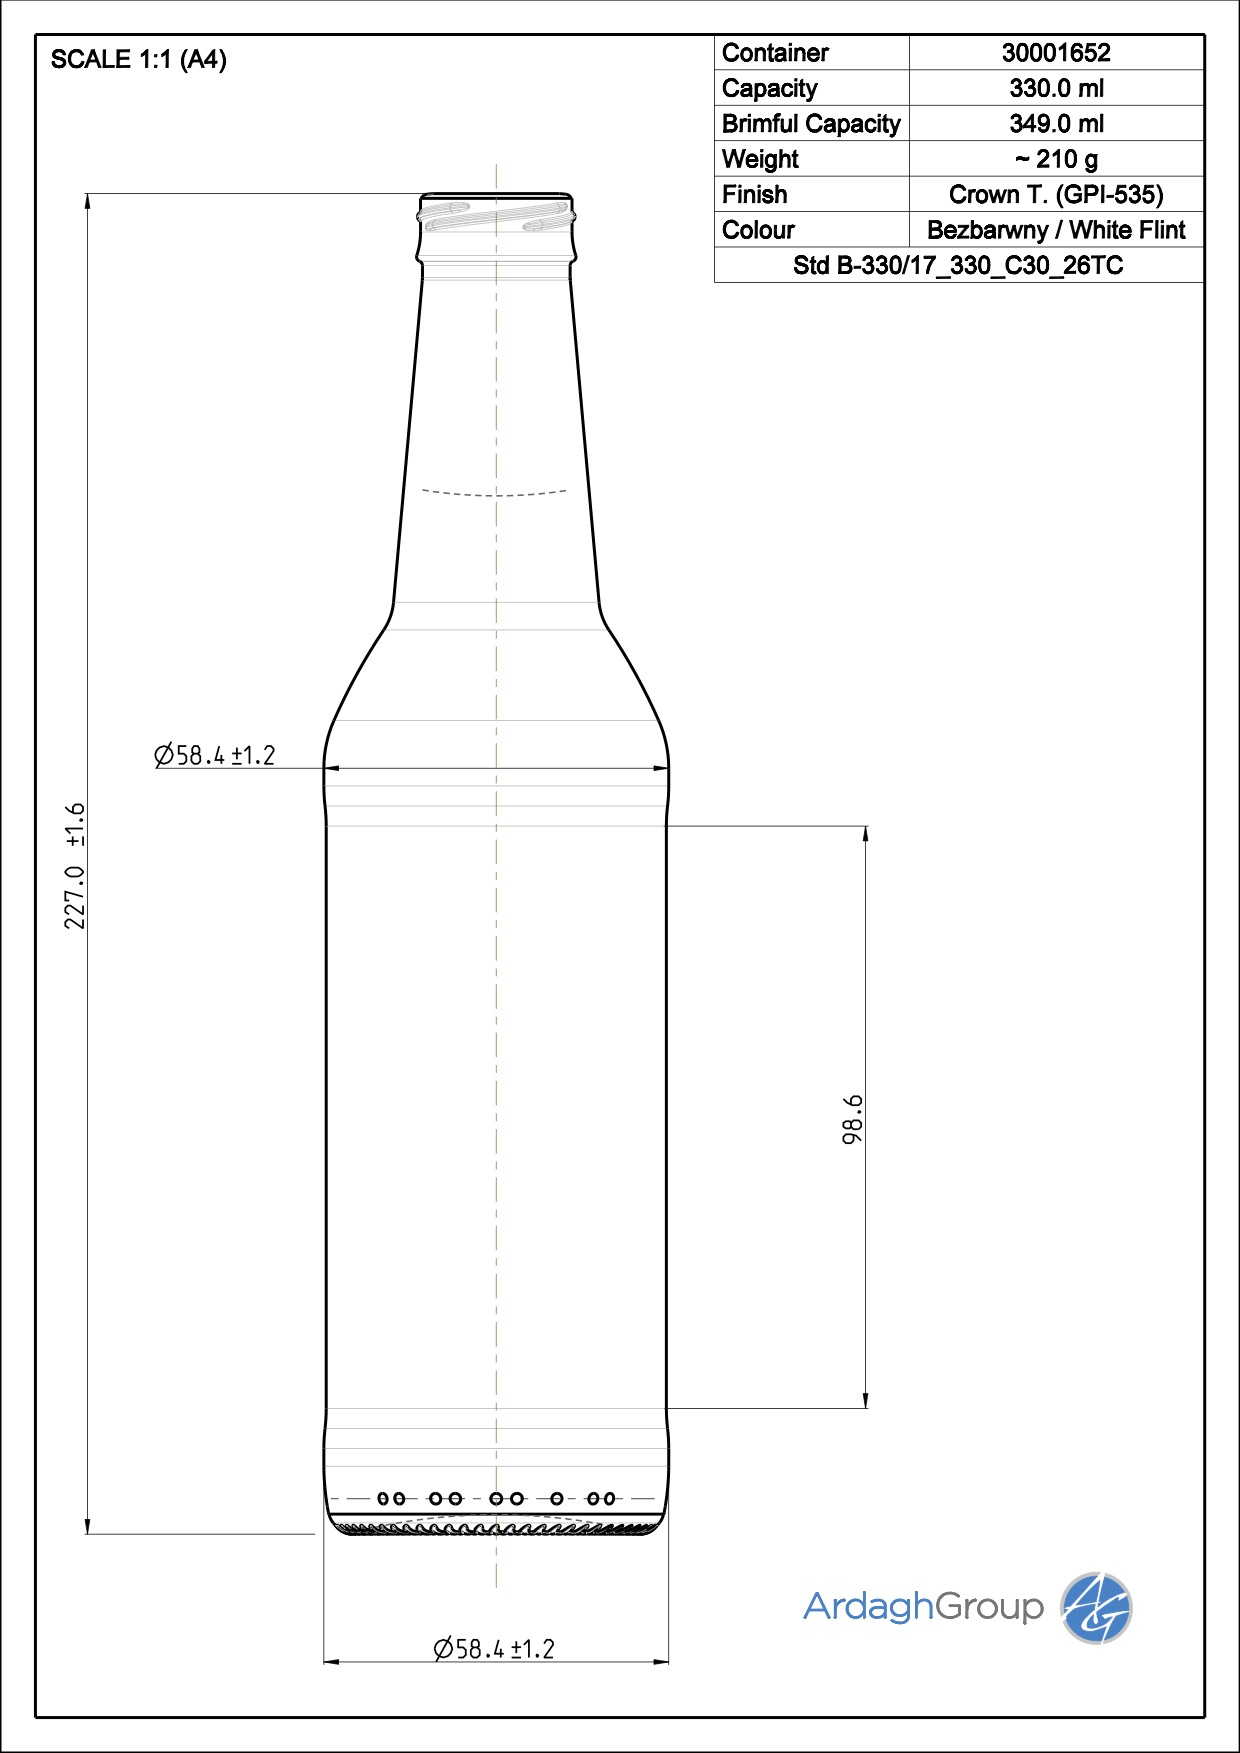 Std B-330/17 330 C30 26TC